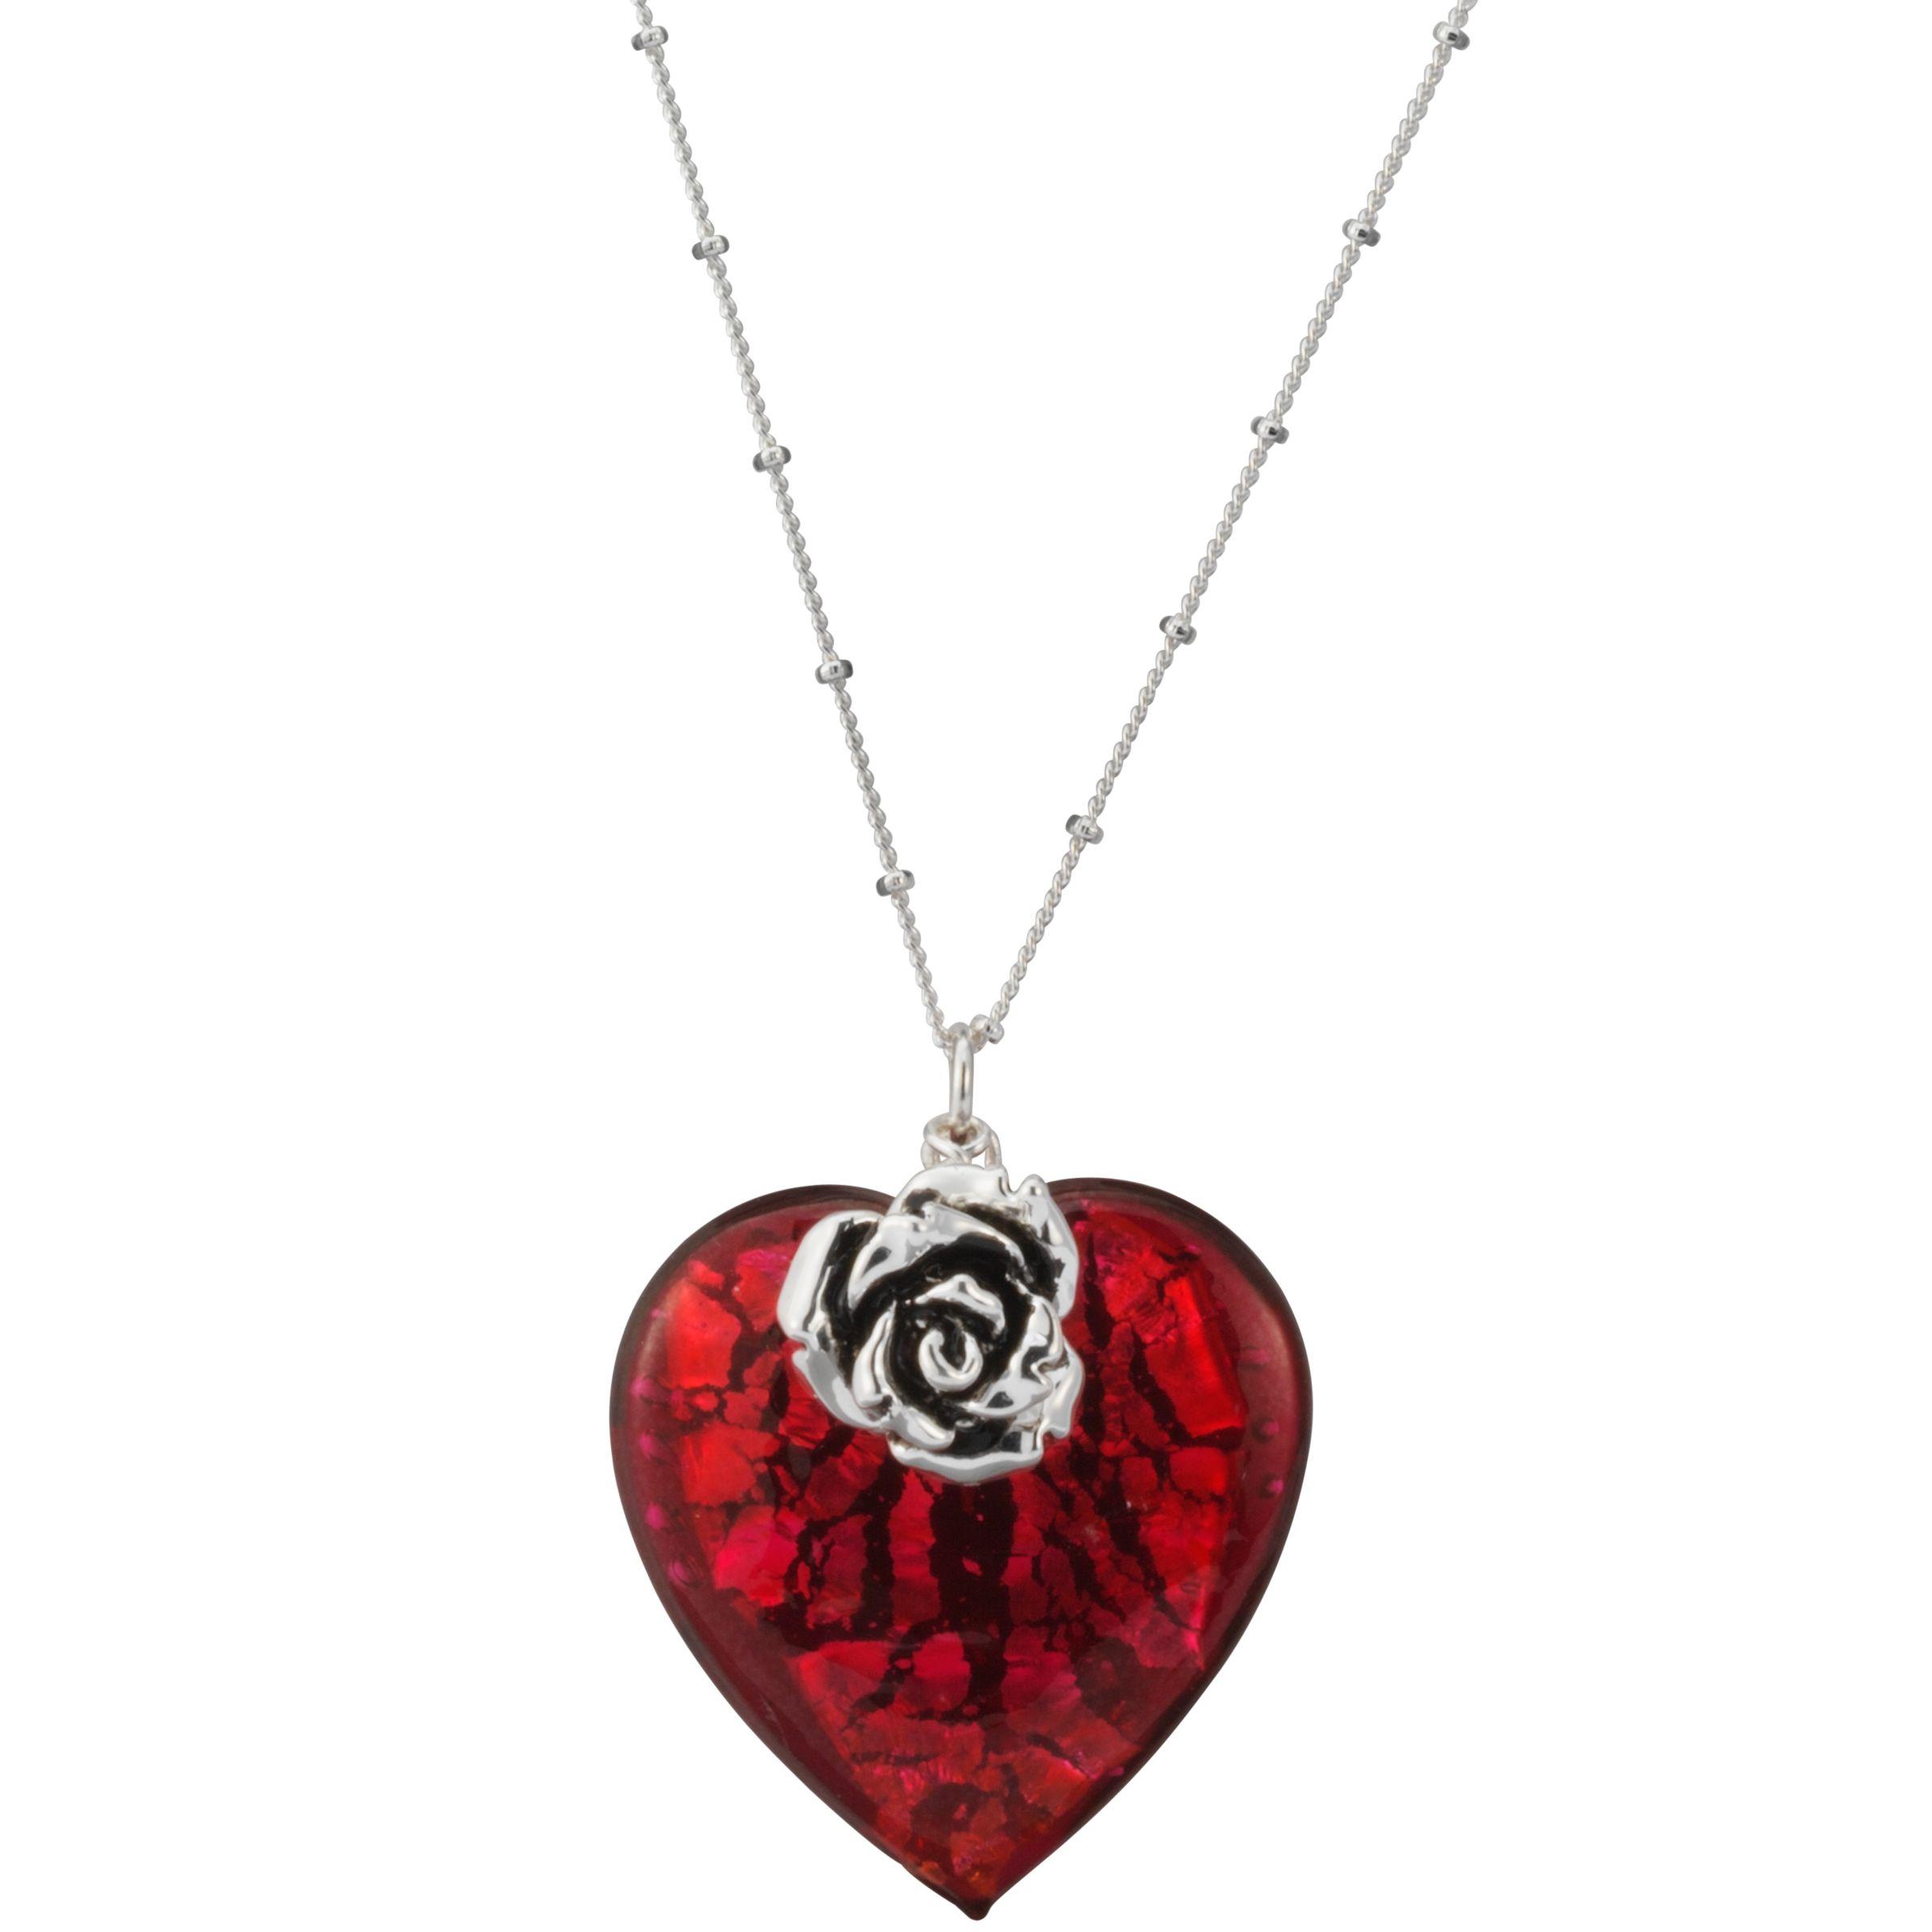 Martick Jewellery Bohemian Glass Heart Necklace